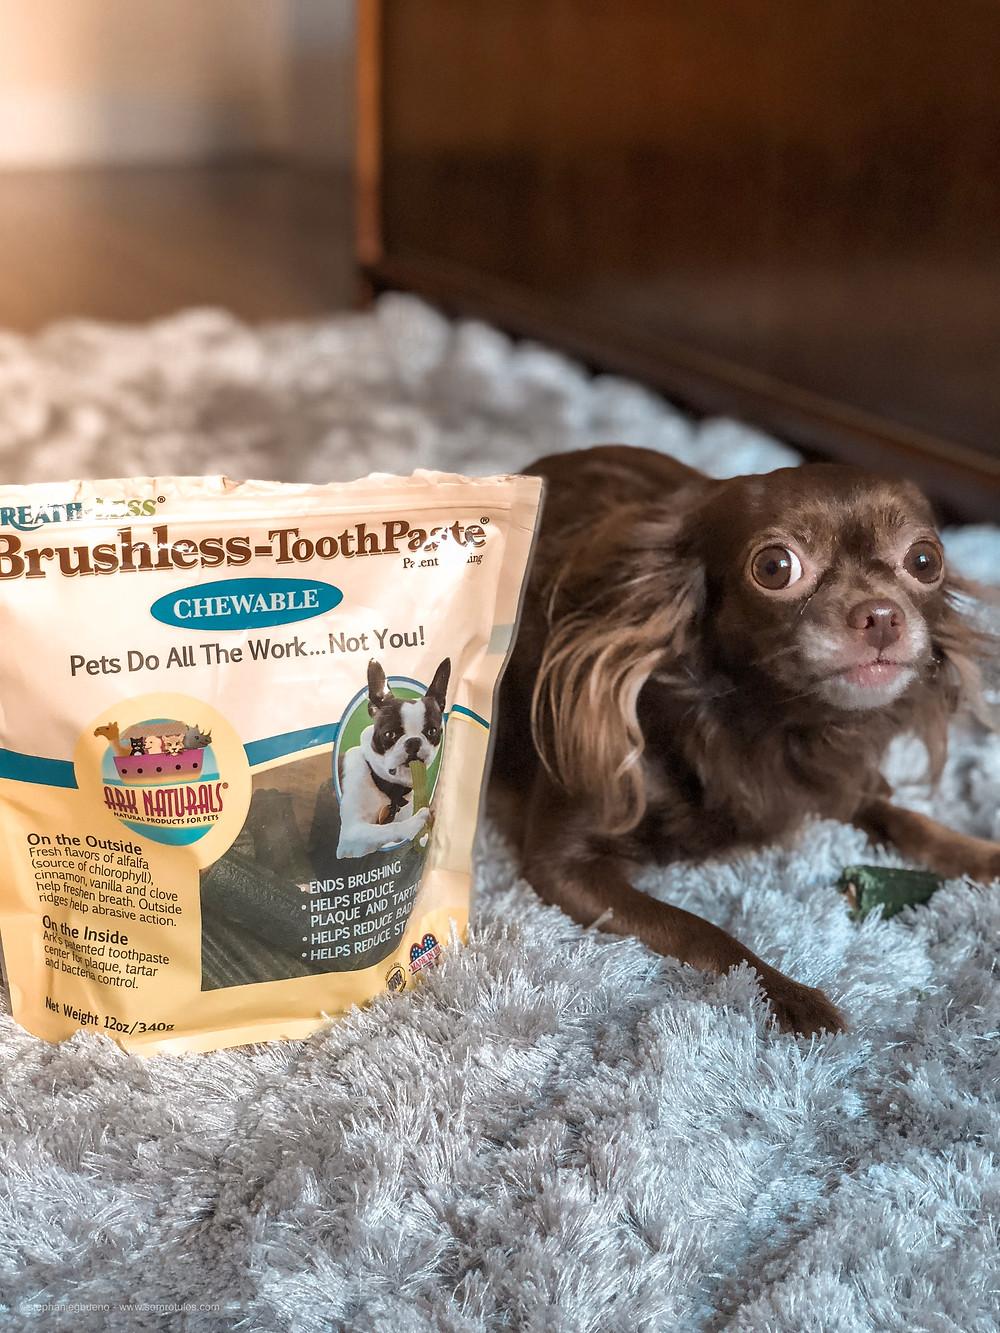 Breath-less Brushless-ToothPaste da Ark Naturals